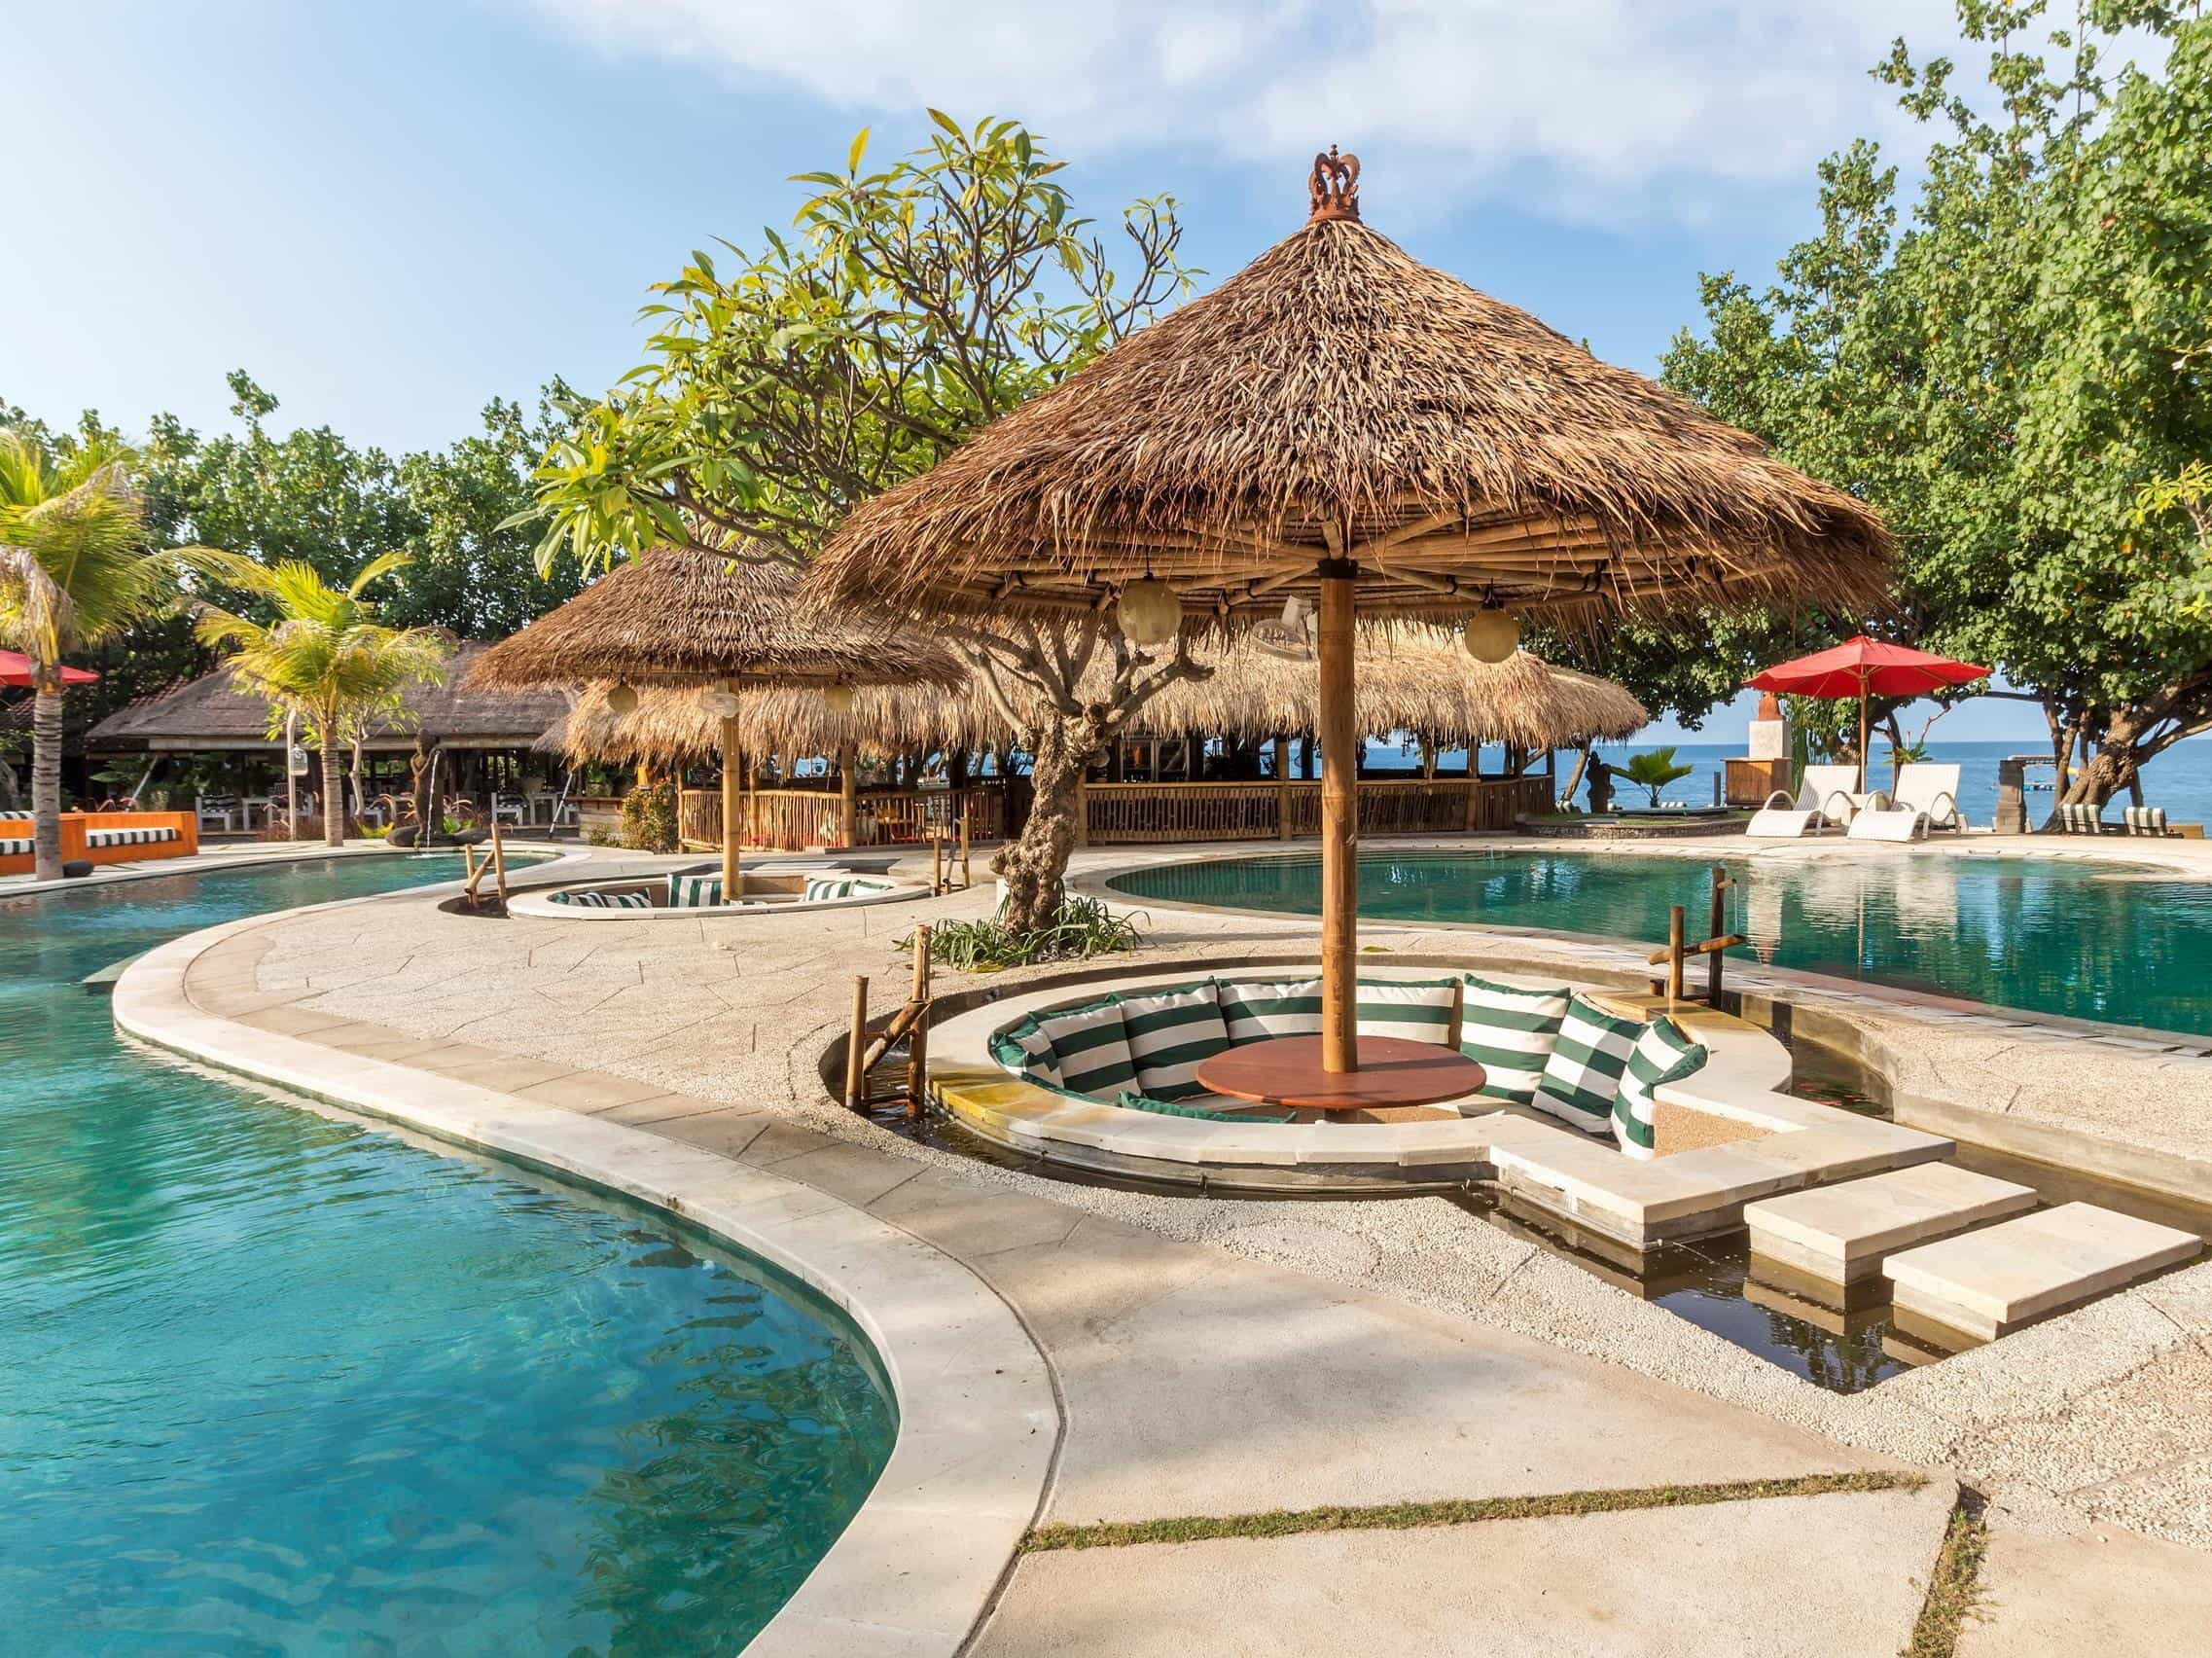 hotel pemuteran bali piscine panorama